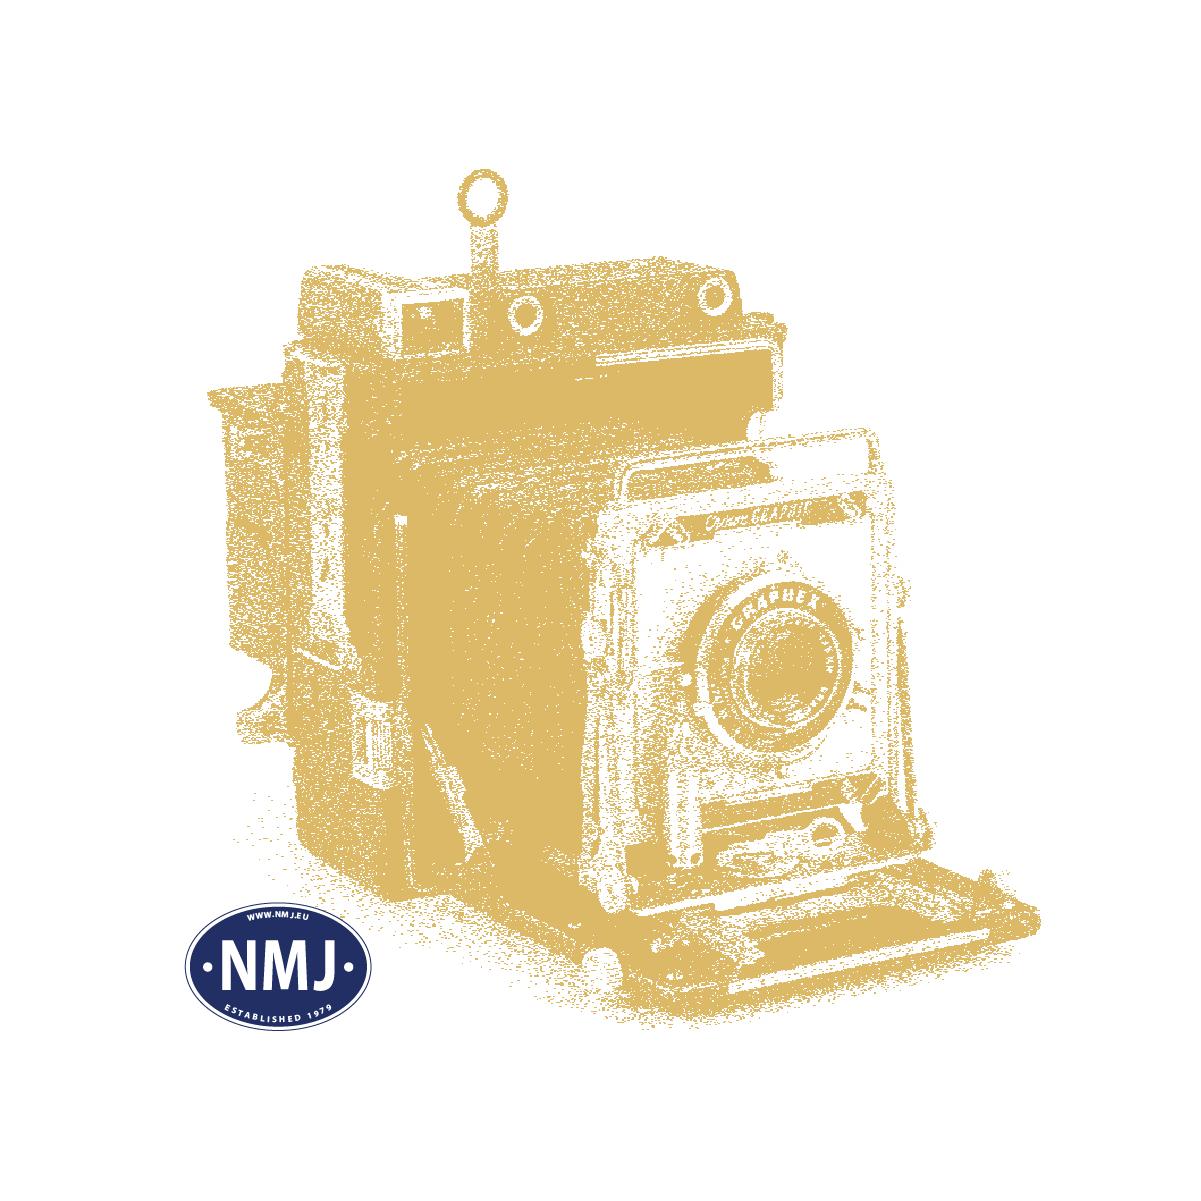 NMJT95403 - NMJ Topline SNCB 5404, AC Digital